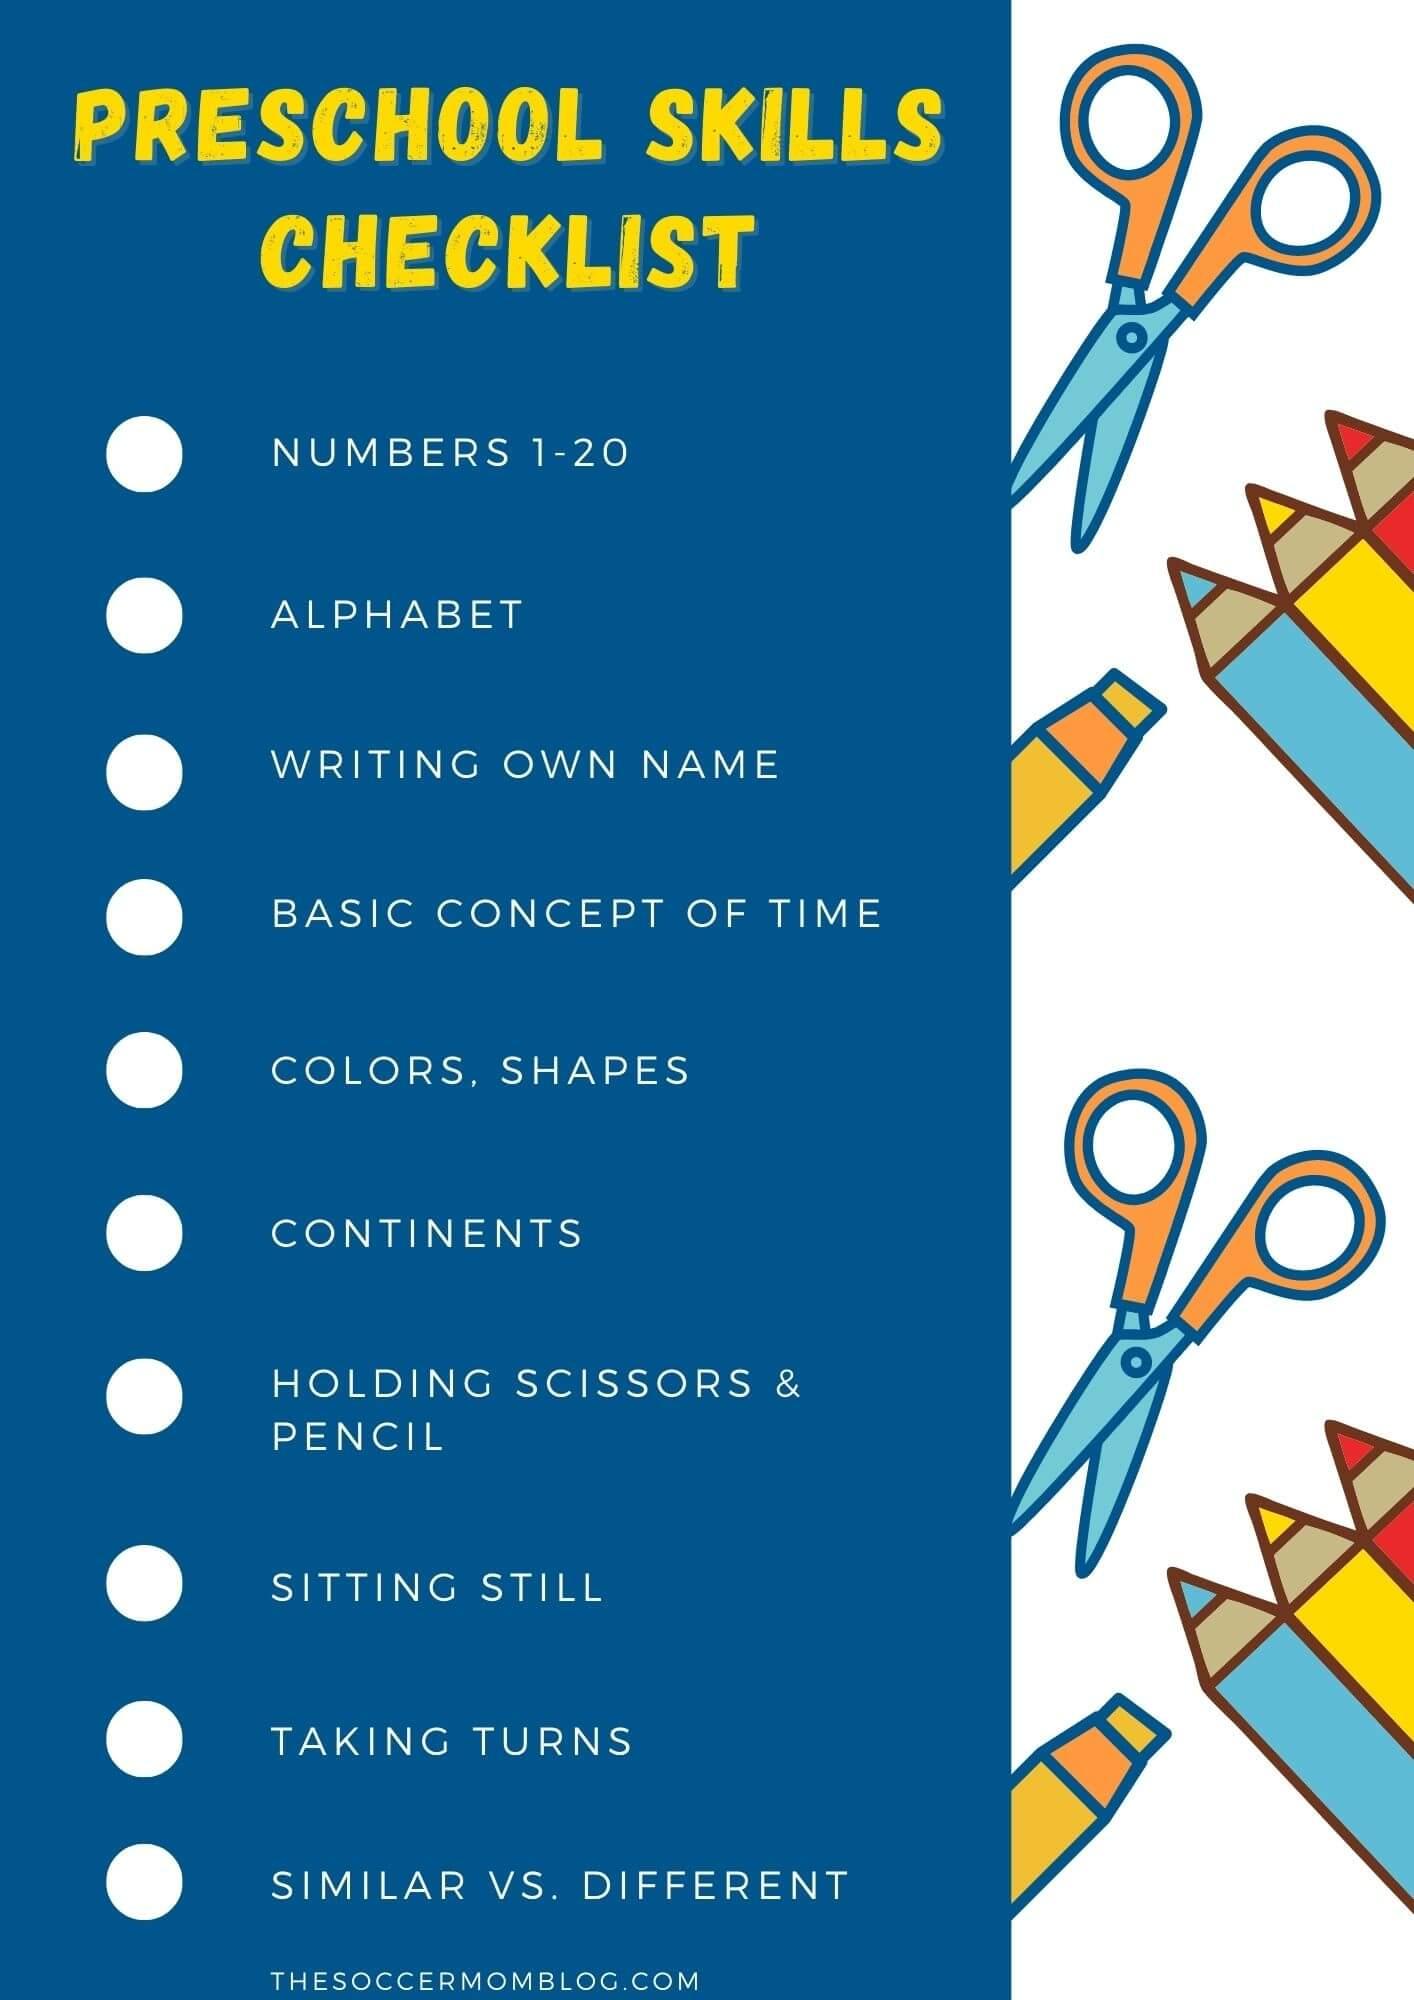 checklist of skills kids learn in preschool